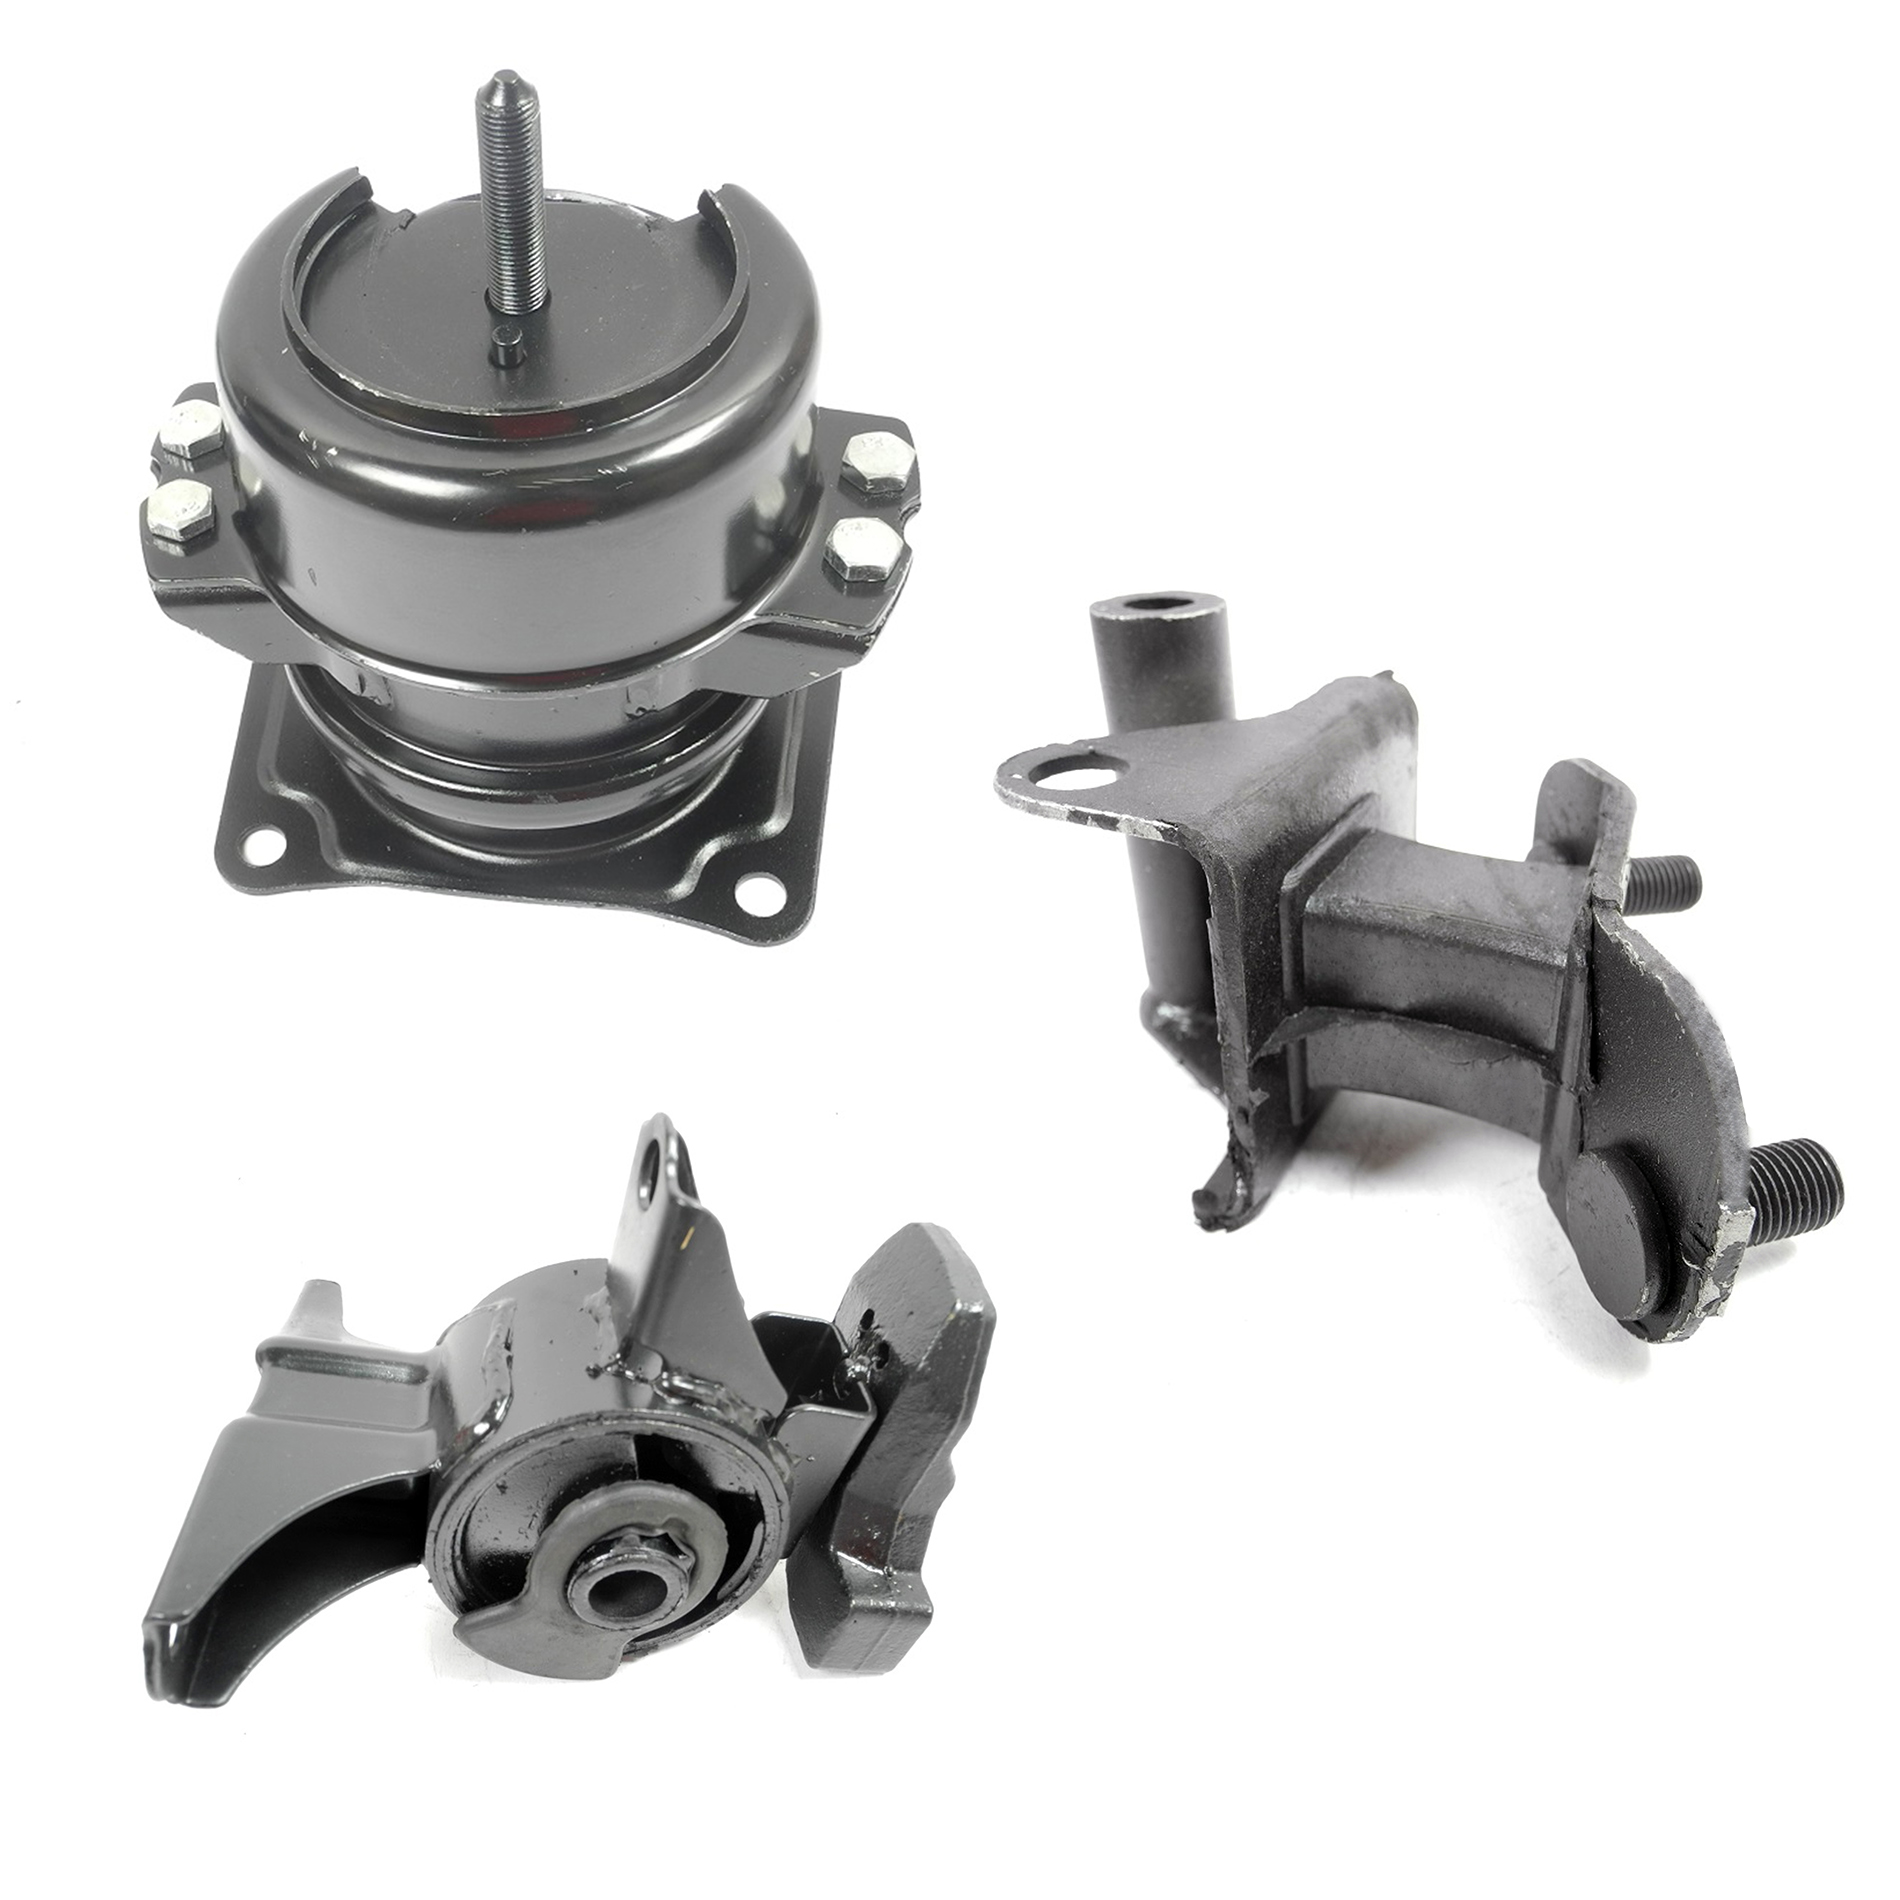 For Acura MDX Base 3.5L 03-06 Engine Motor & Trans Mount